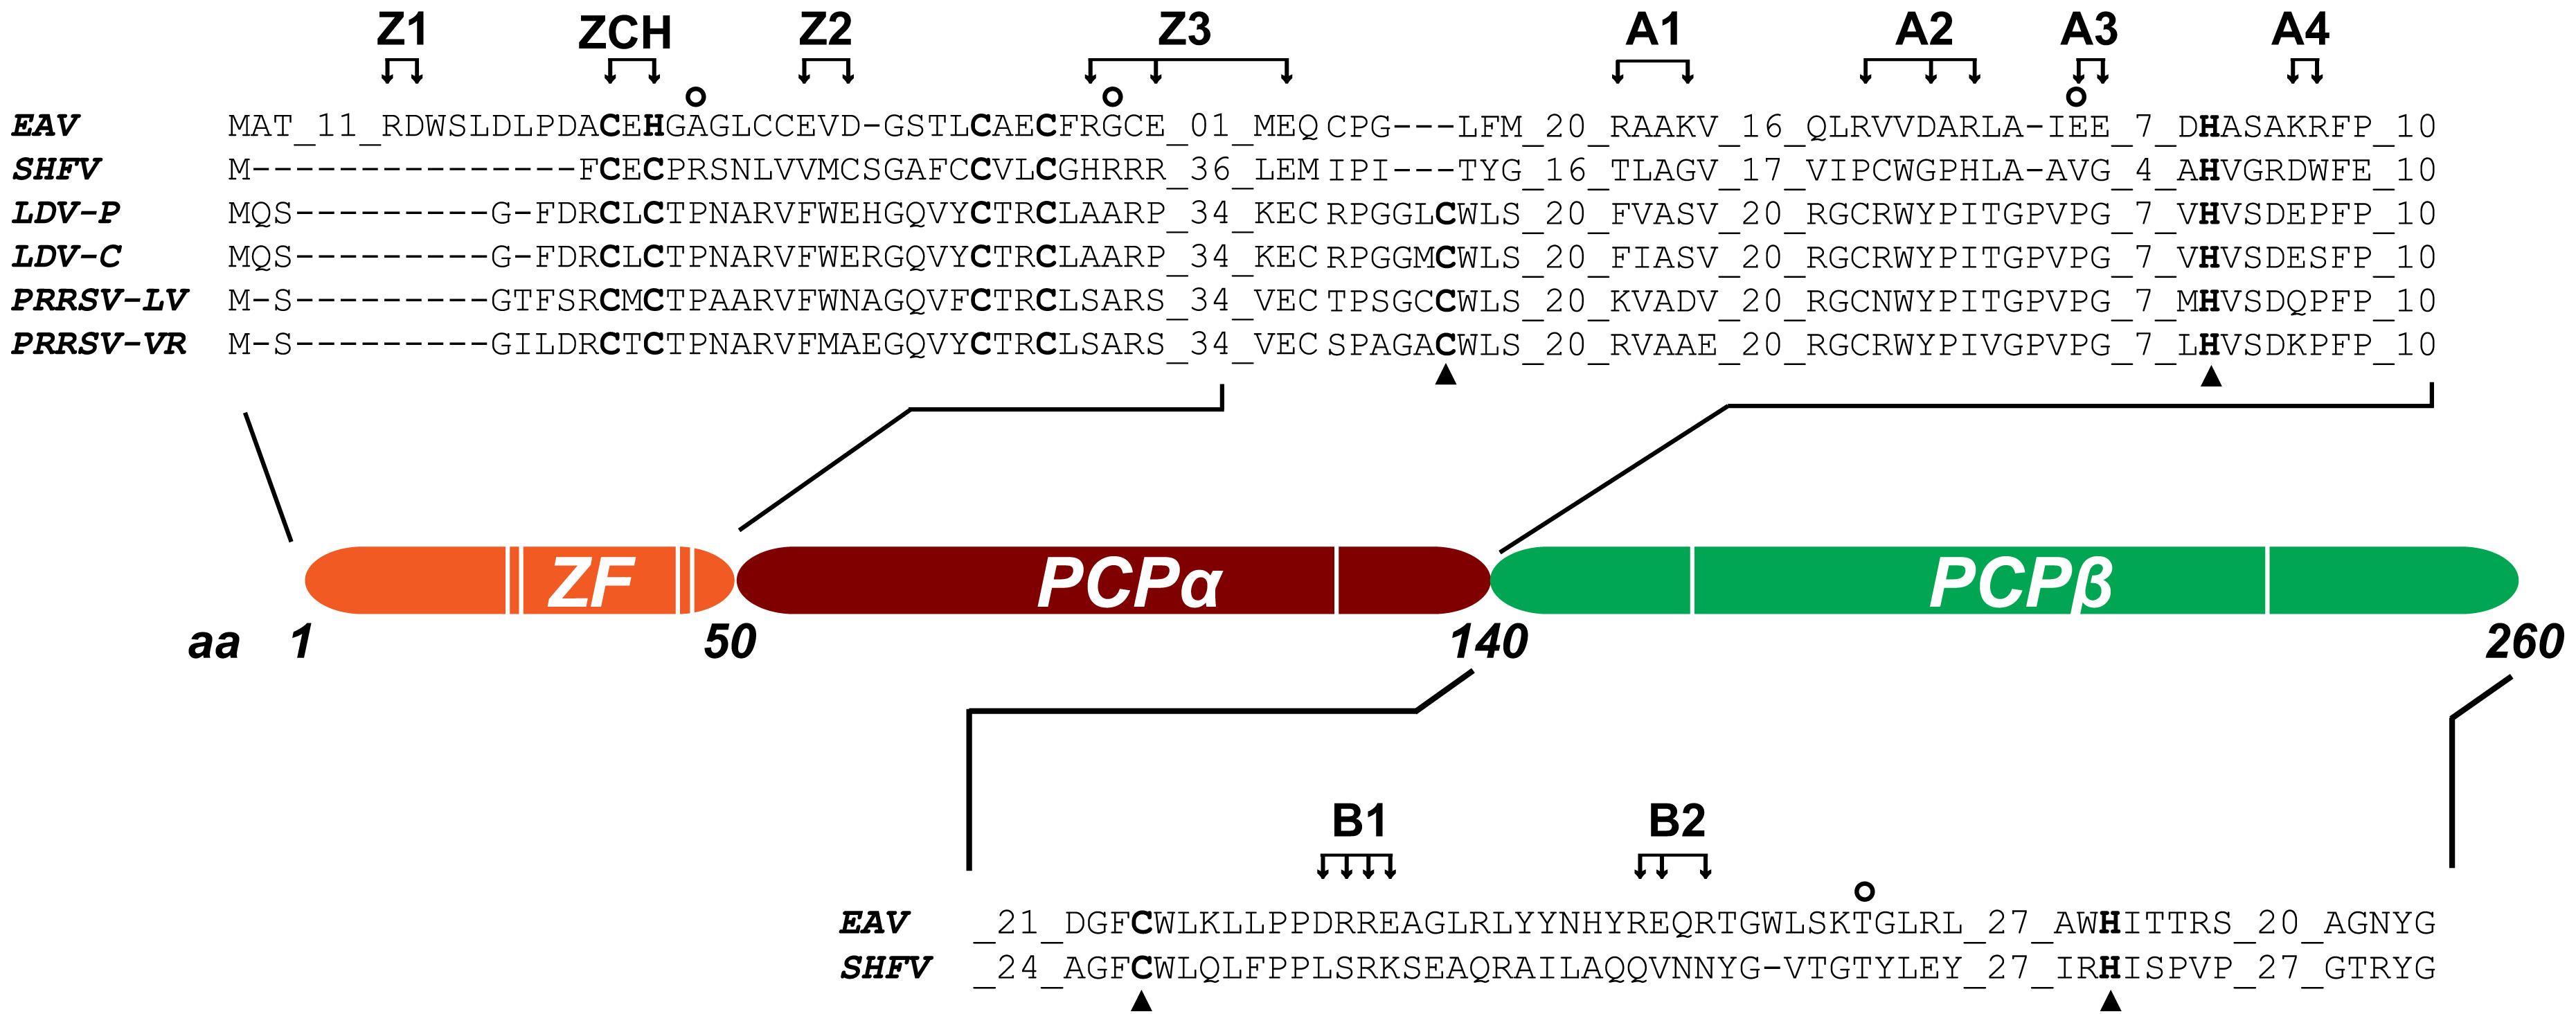 Domain organization of EAV nsp1.